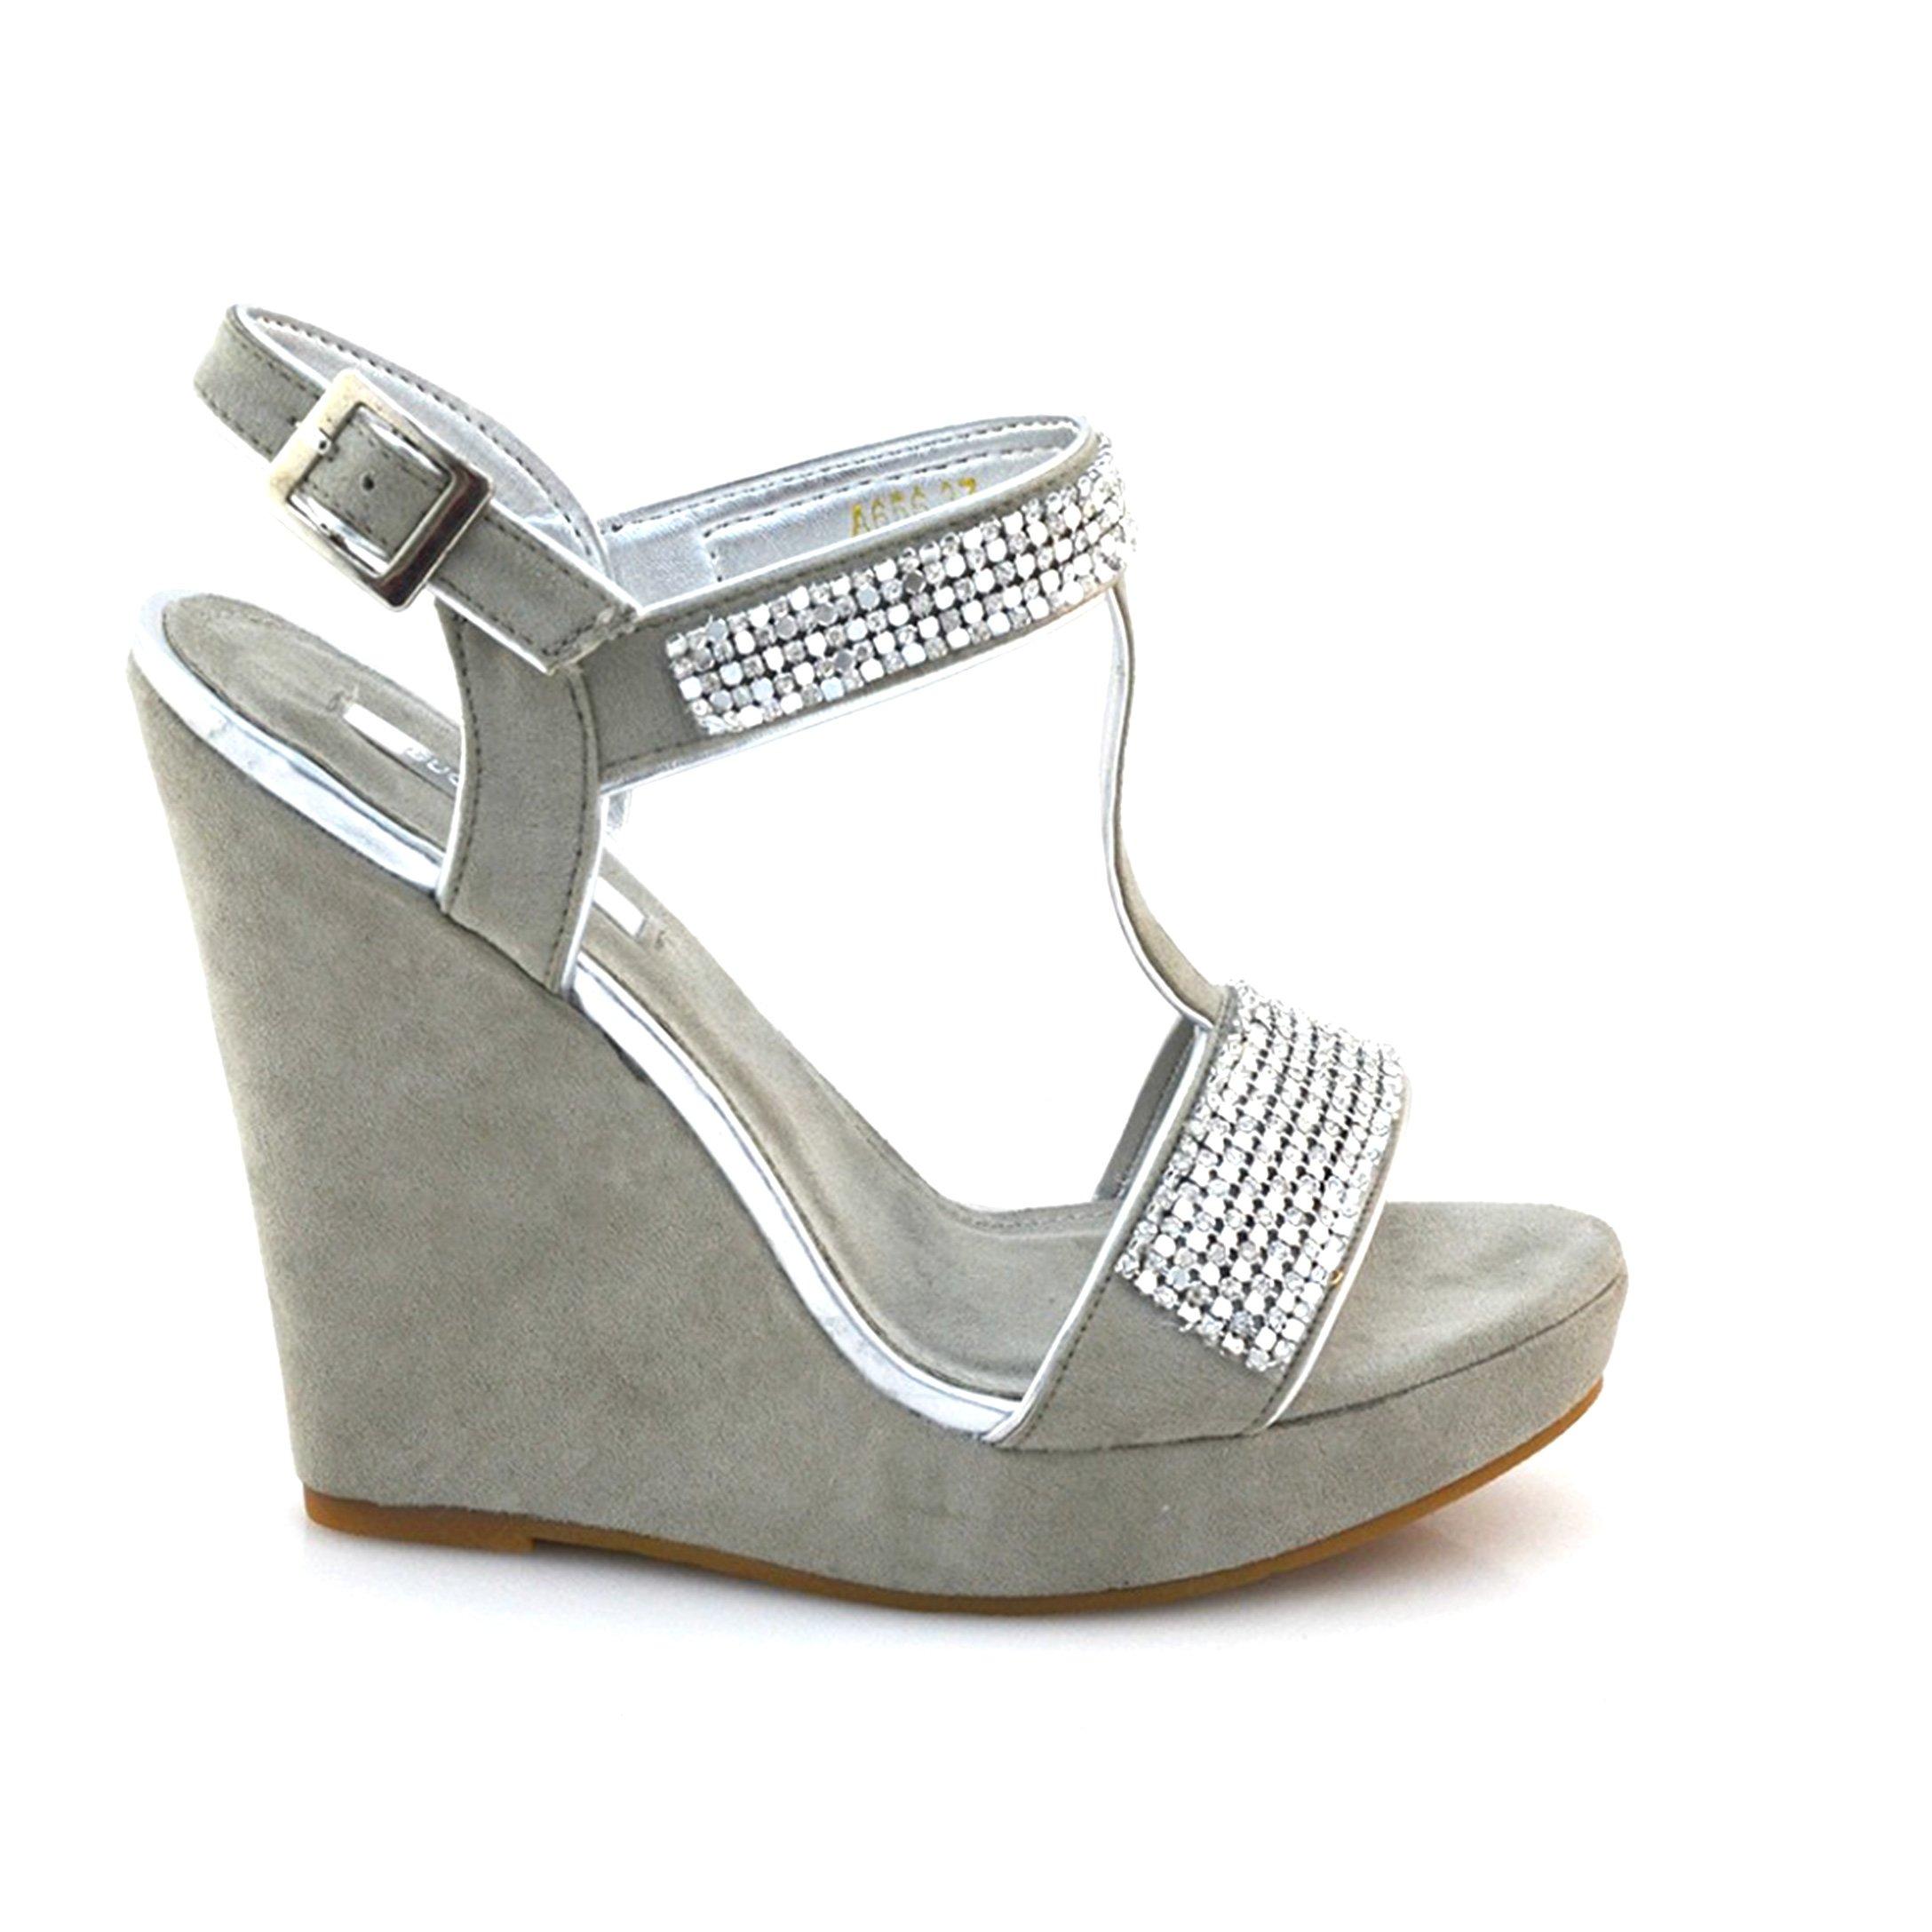 Sandale dama cu platforma si strasuri – gri